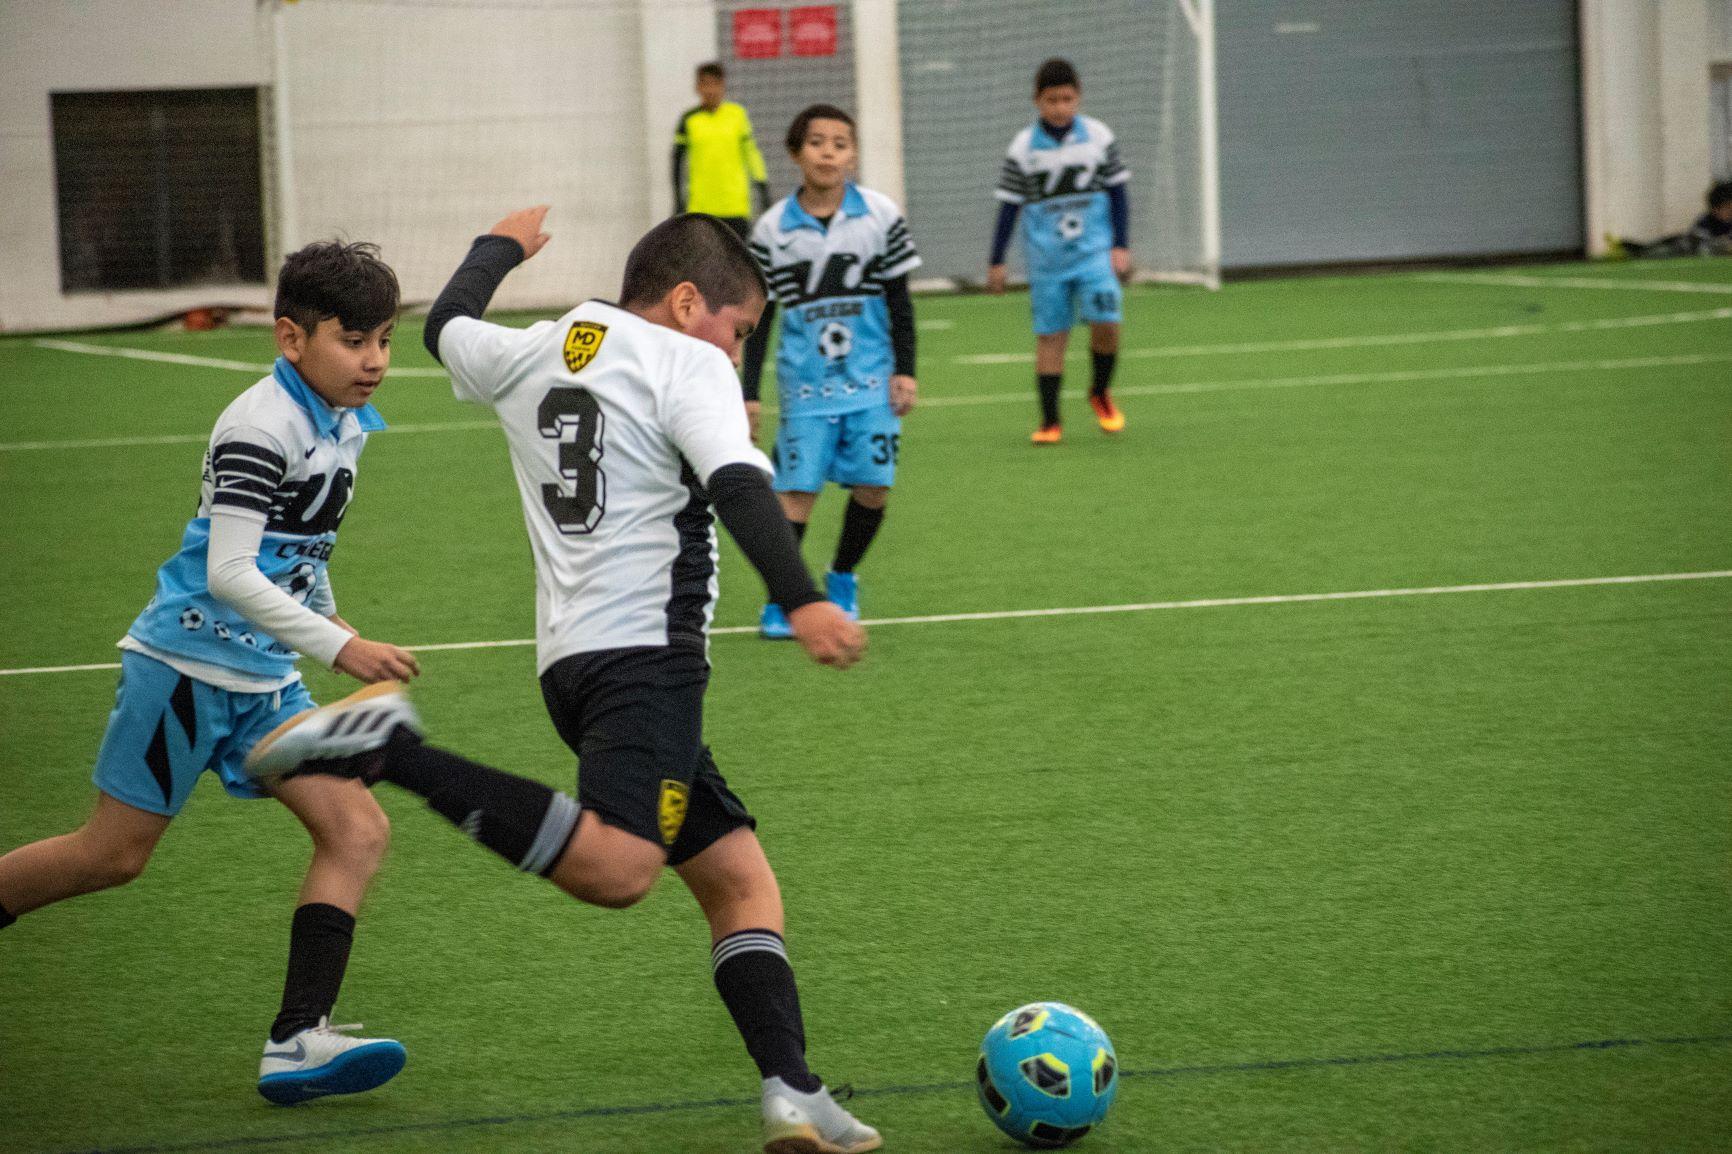 Youth Indoor Boys - Striker